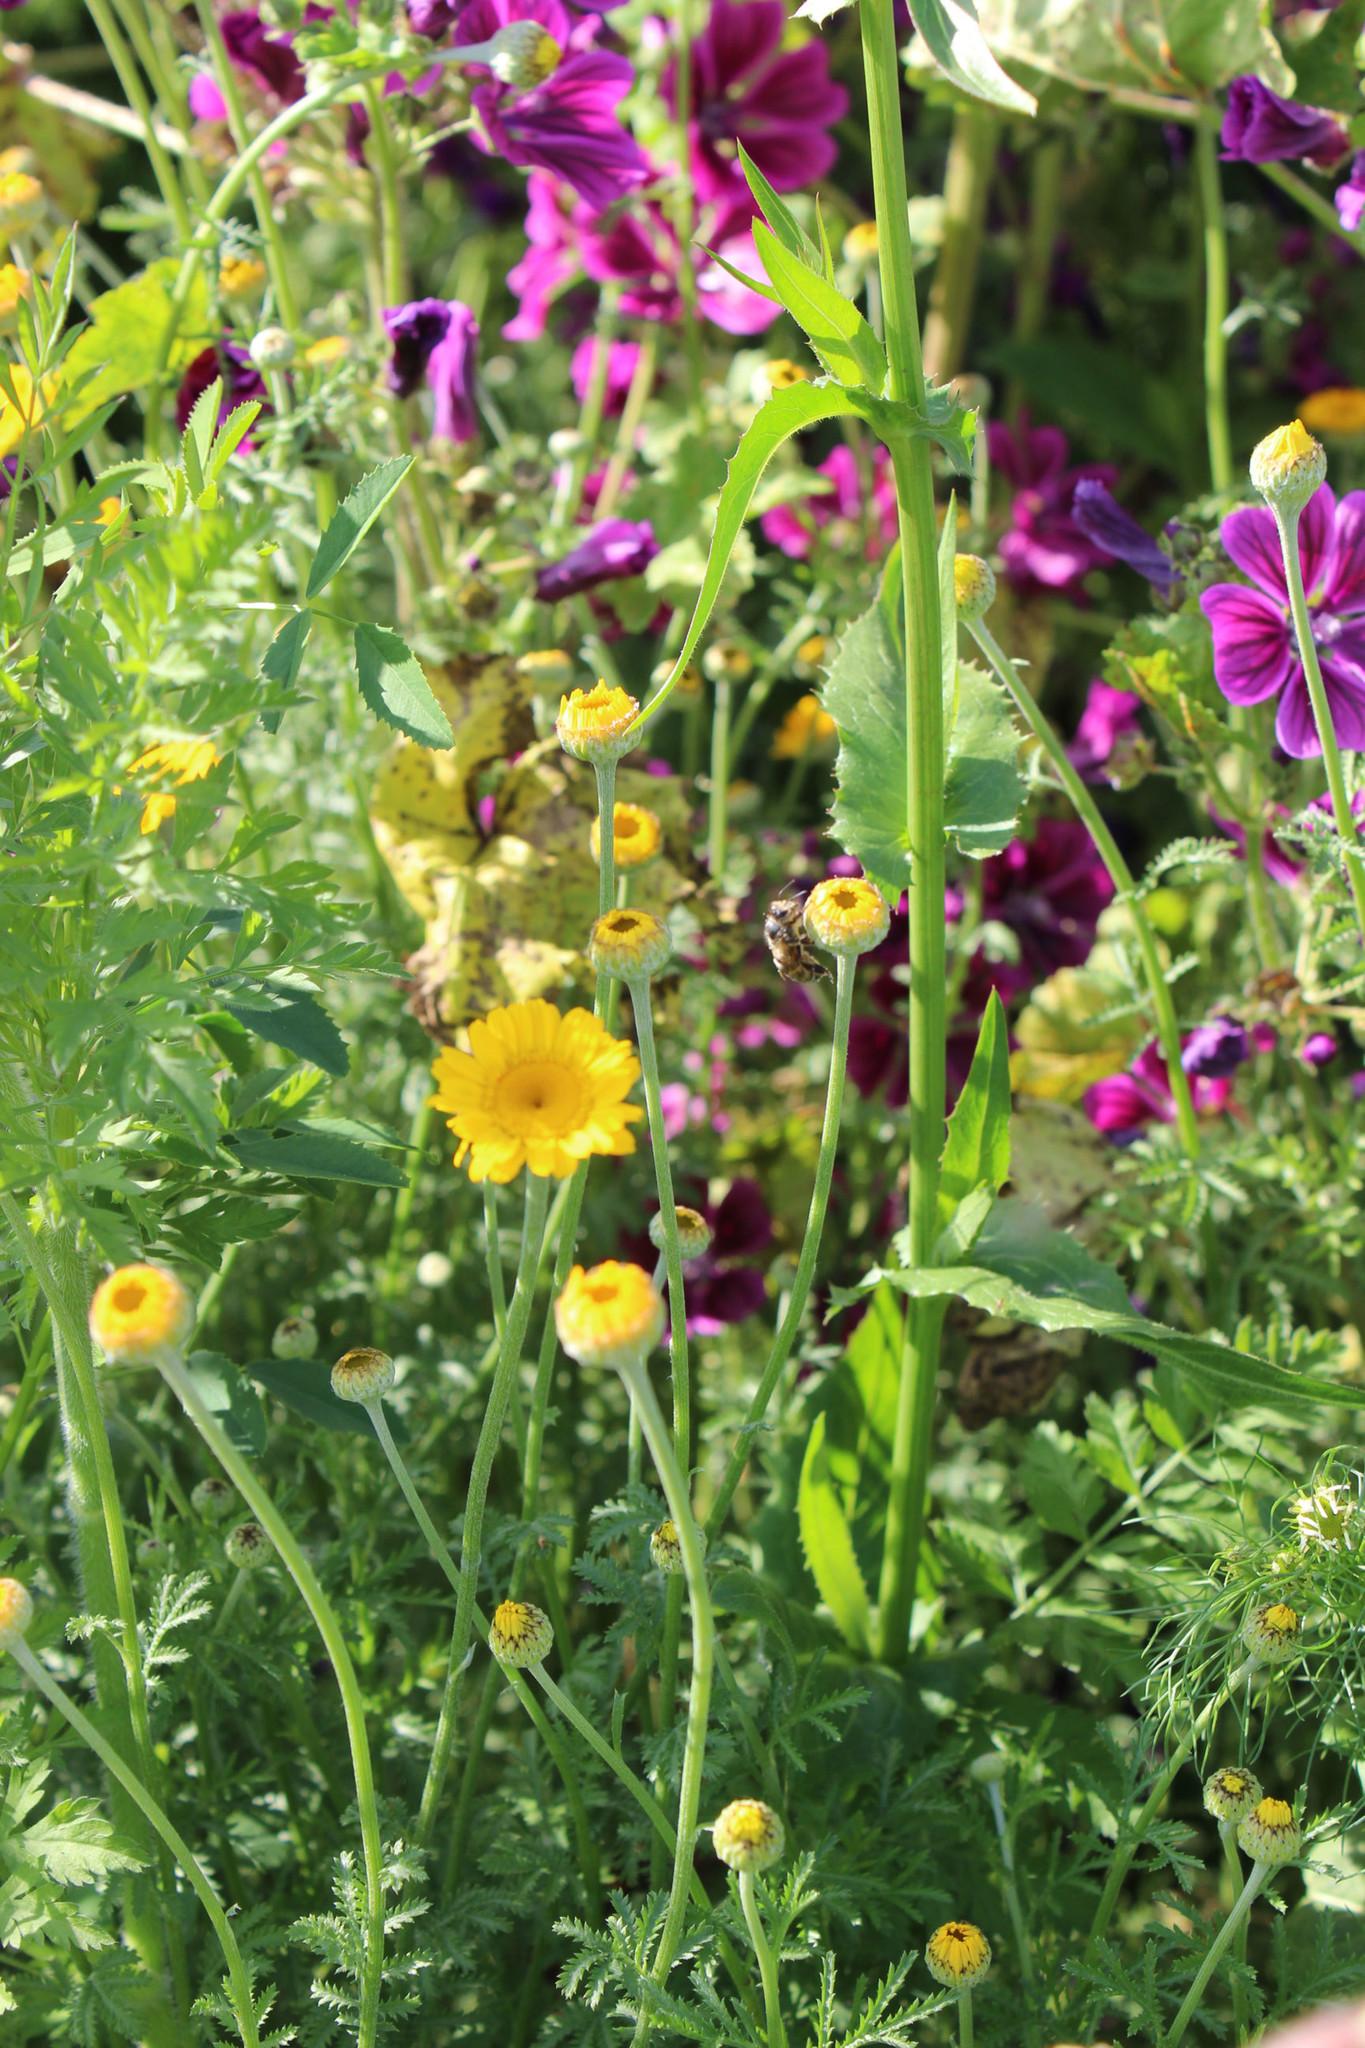 Wildpflanzensaatgutmischung LJ-Blüh-Opti 10kg - Copy